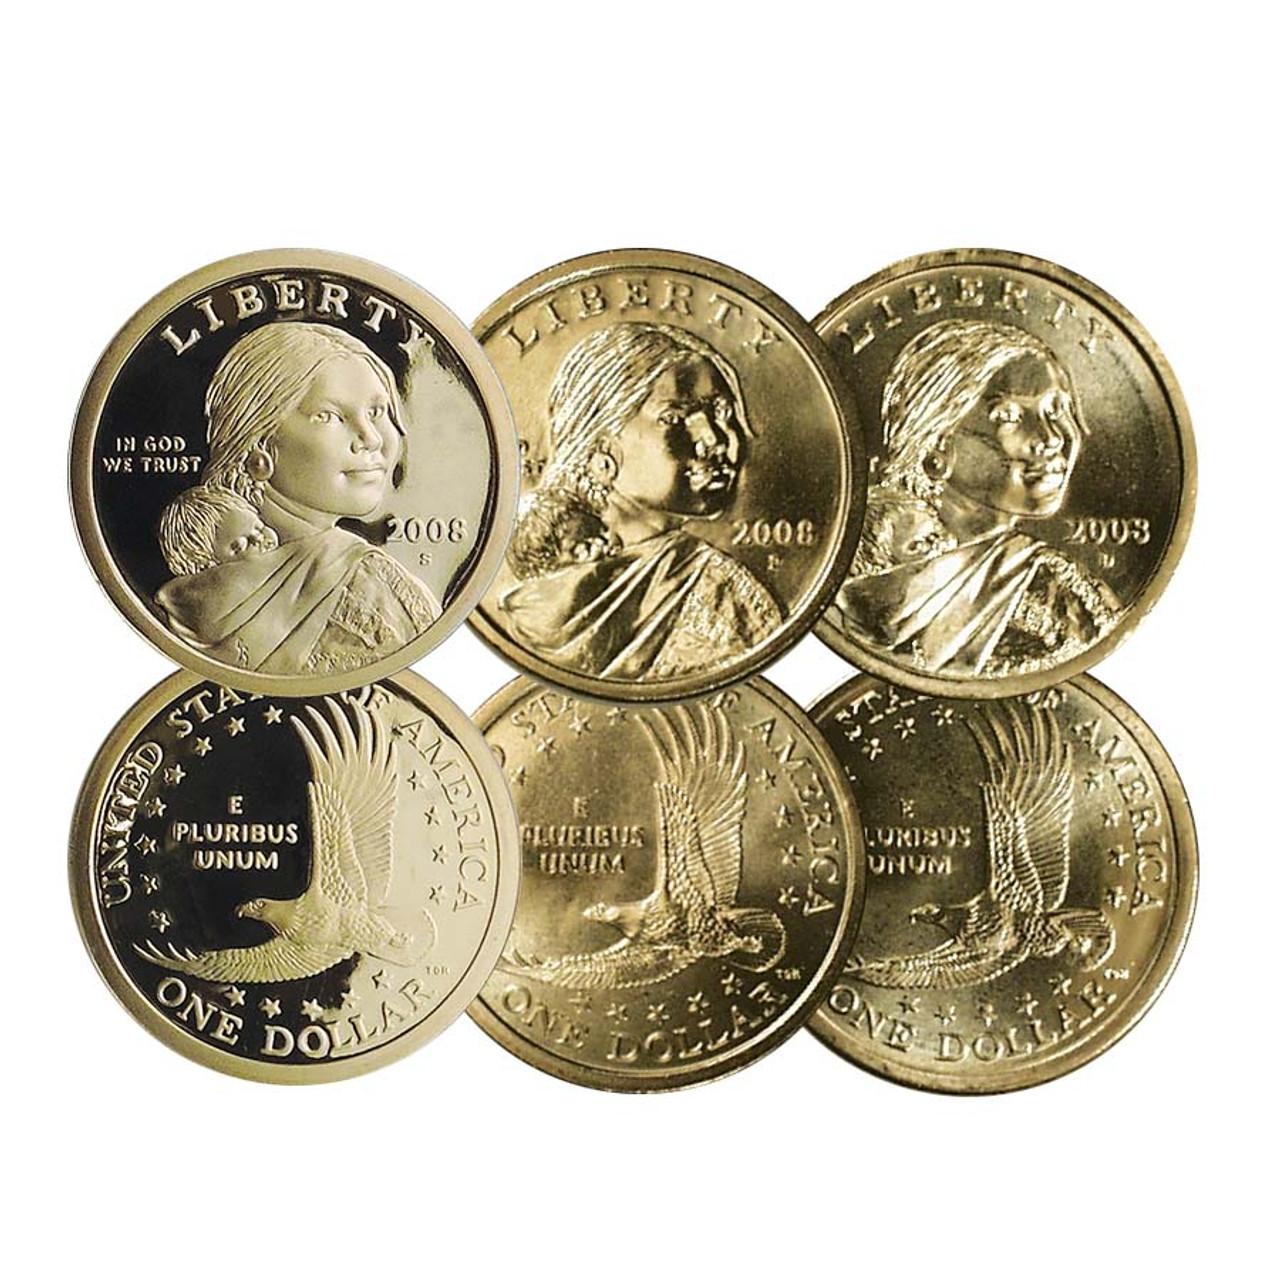 2008 Sacagawea Dollar Proof with FREE P & D BU